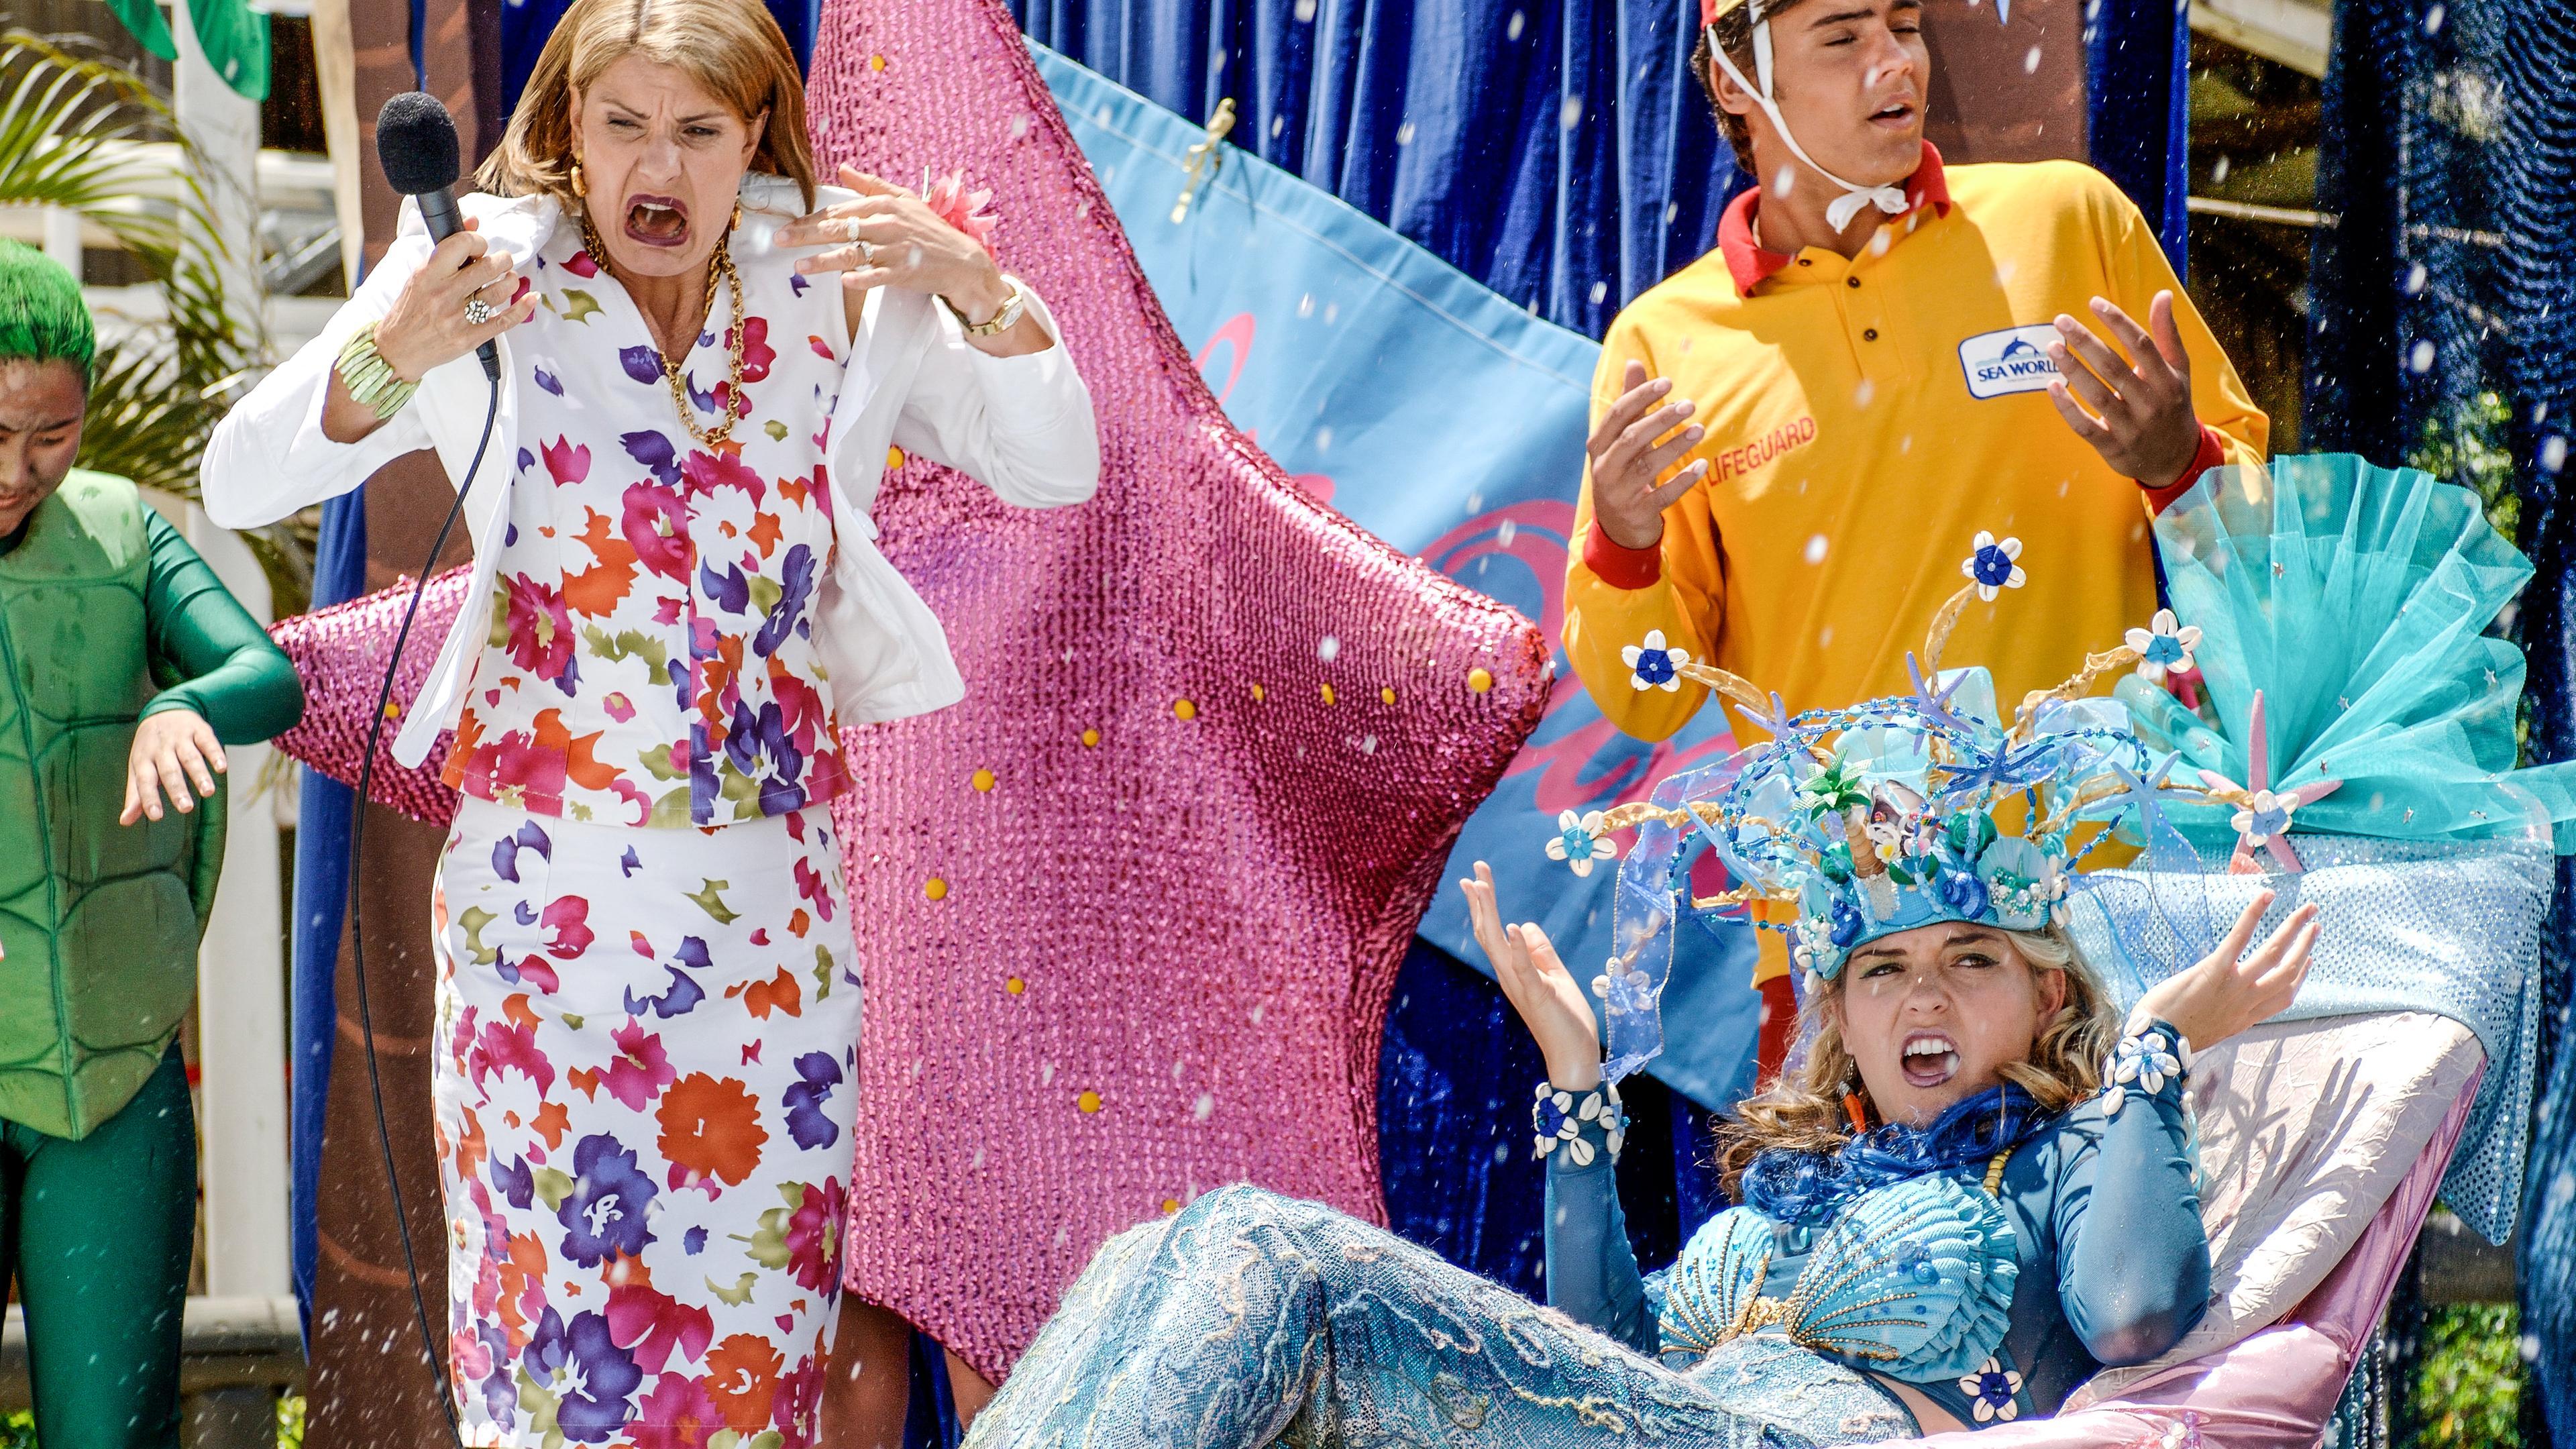 H2o Plotzlich Meerjungfrau Zdftivi